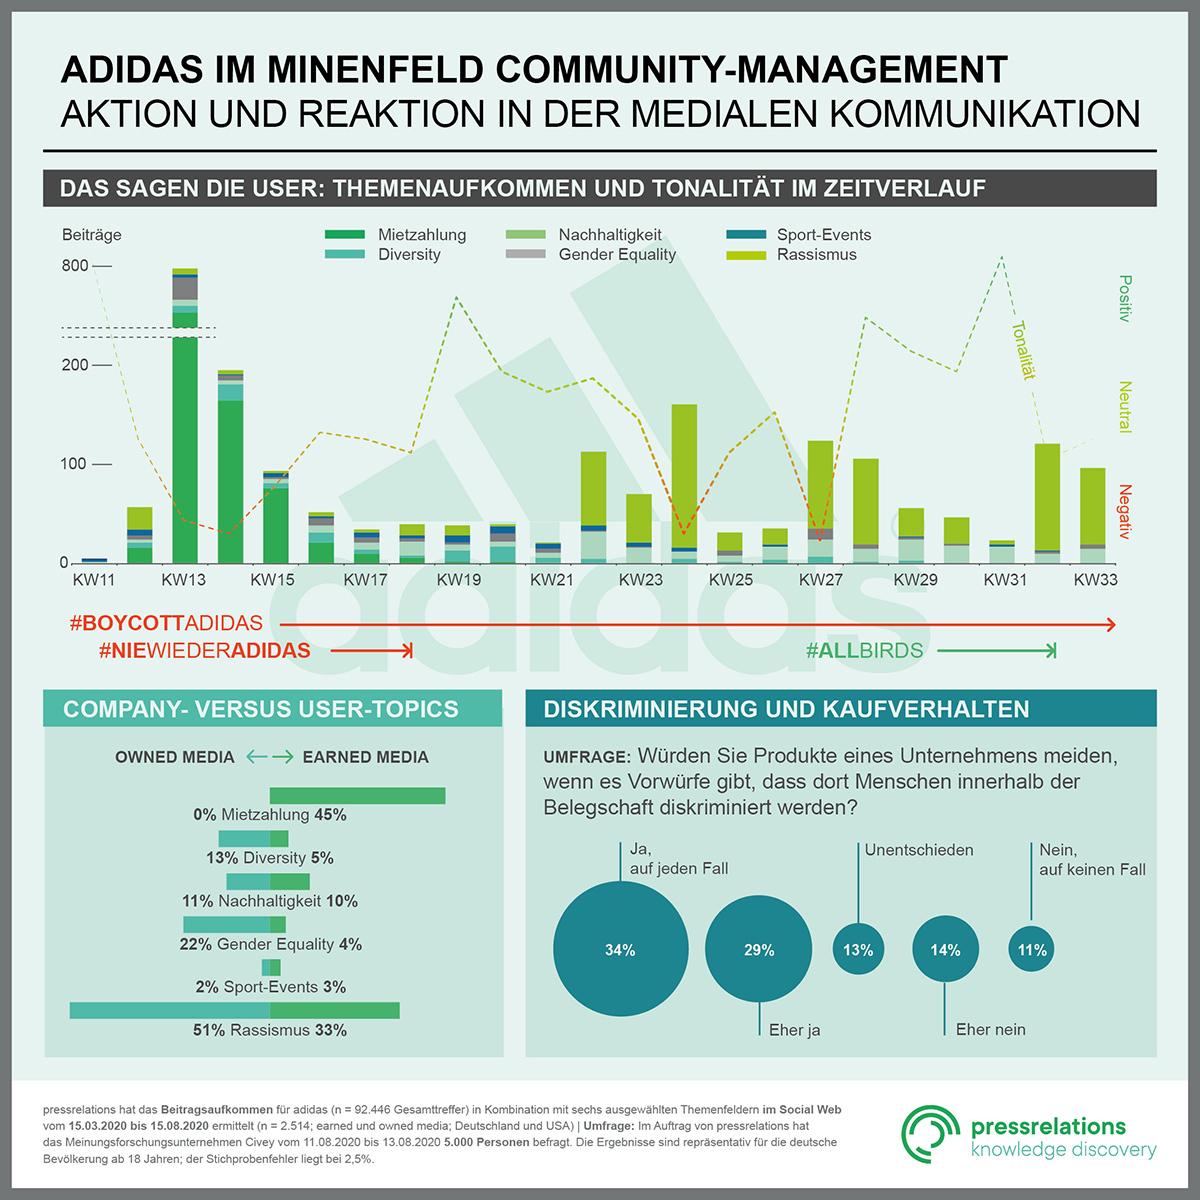 Adidas Risikothemenanalyse von pressrelations